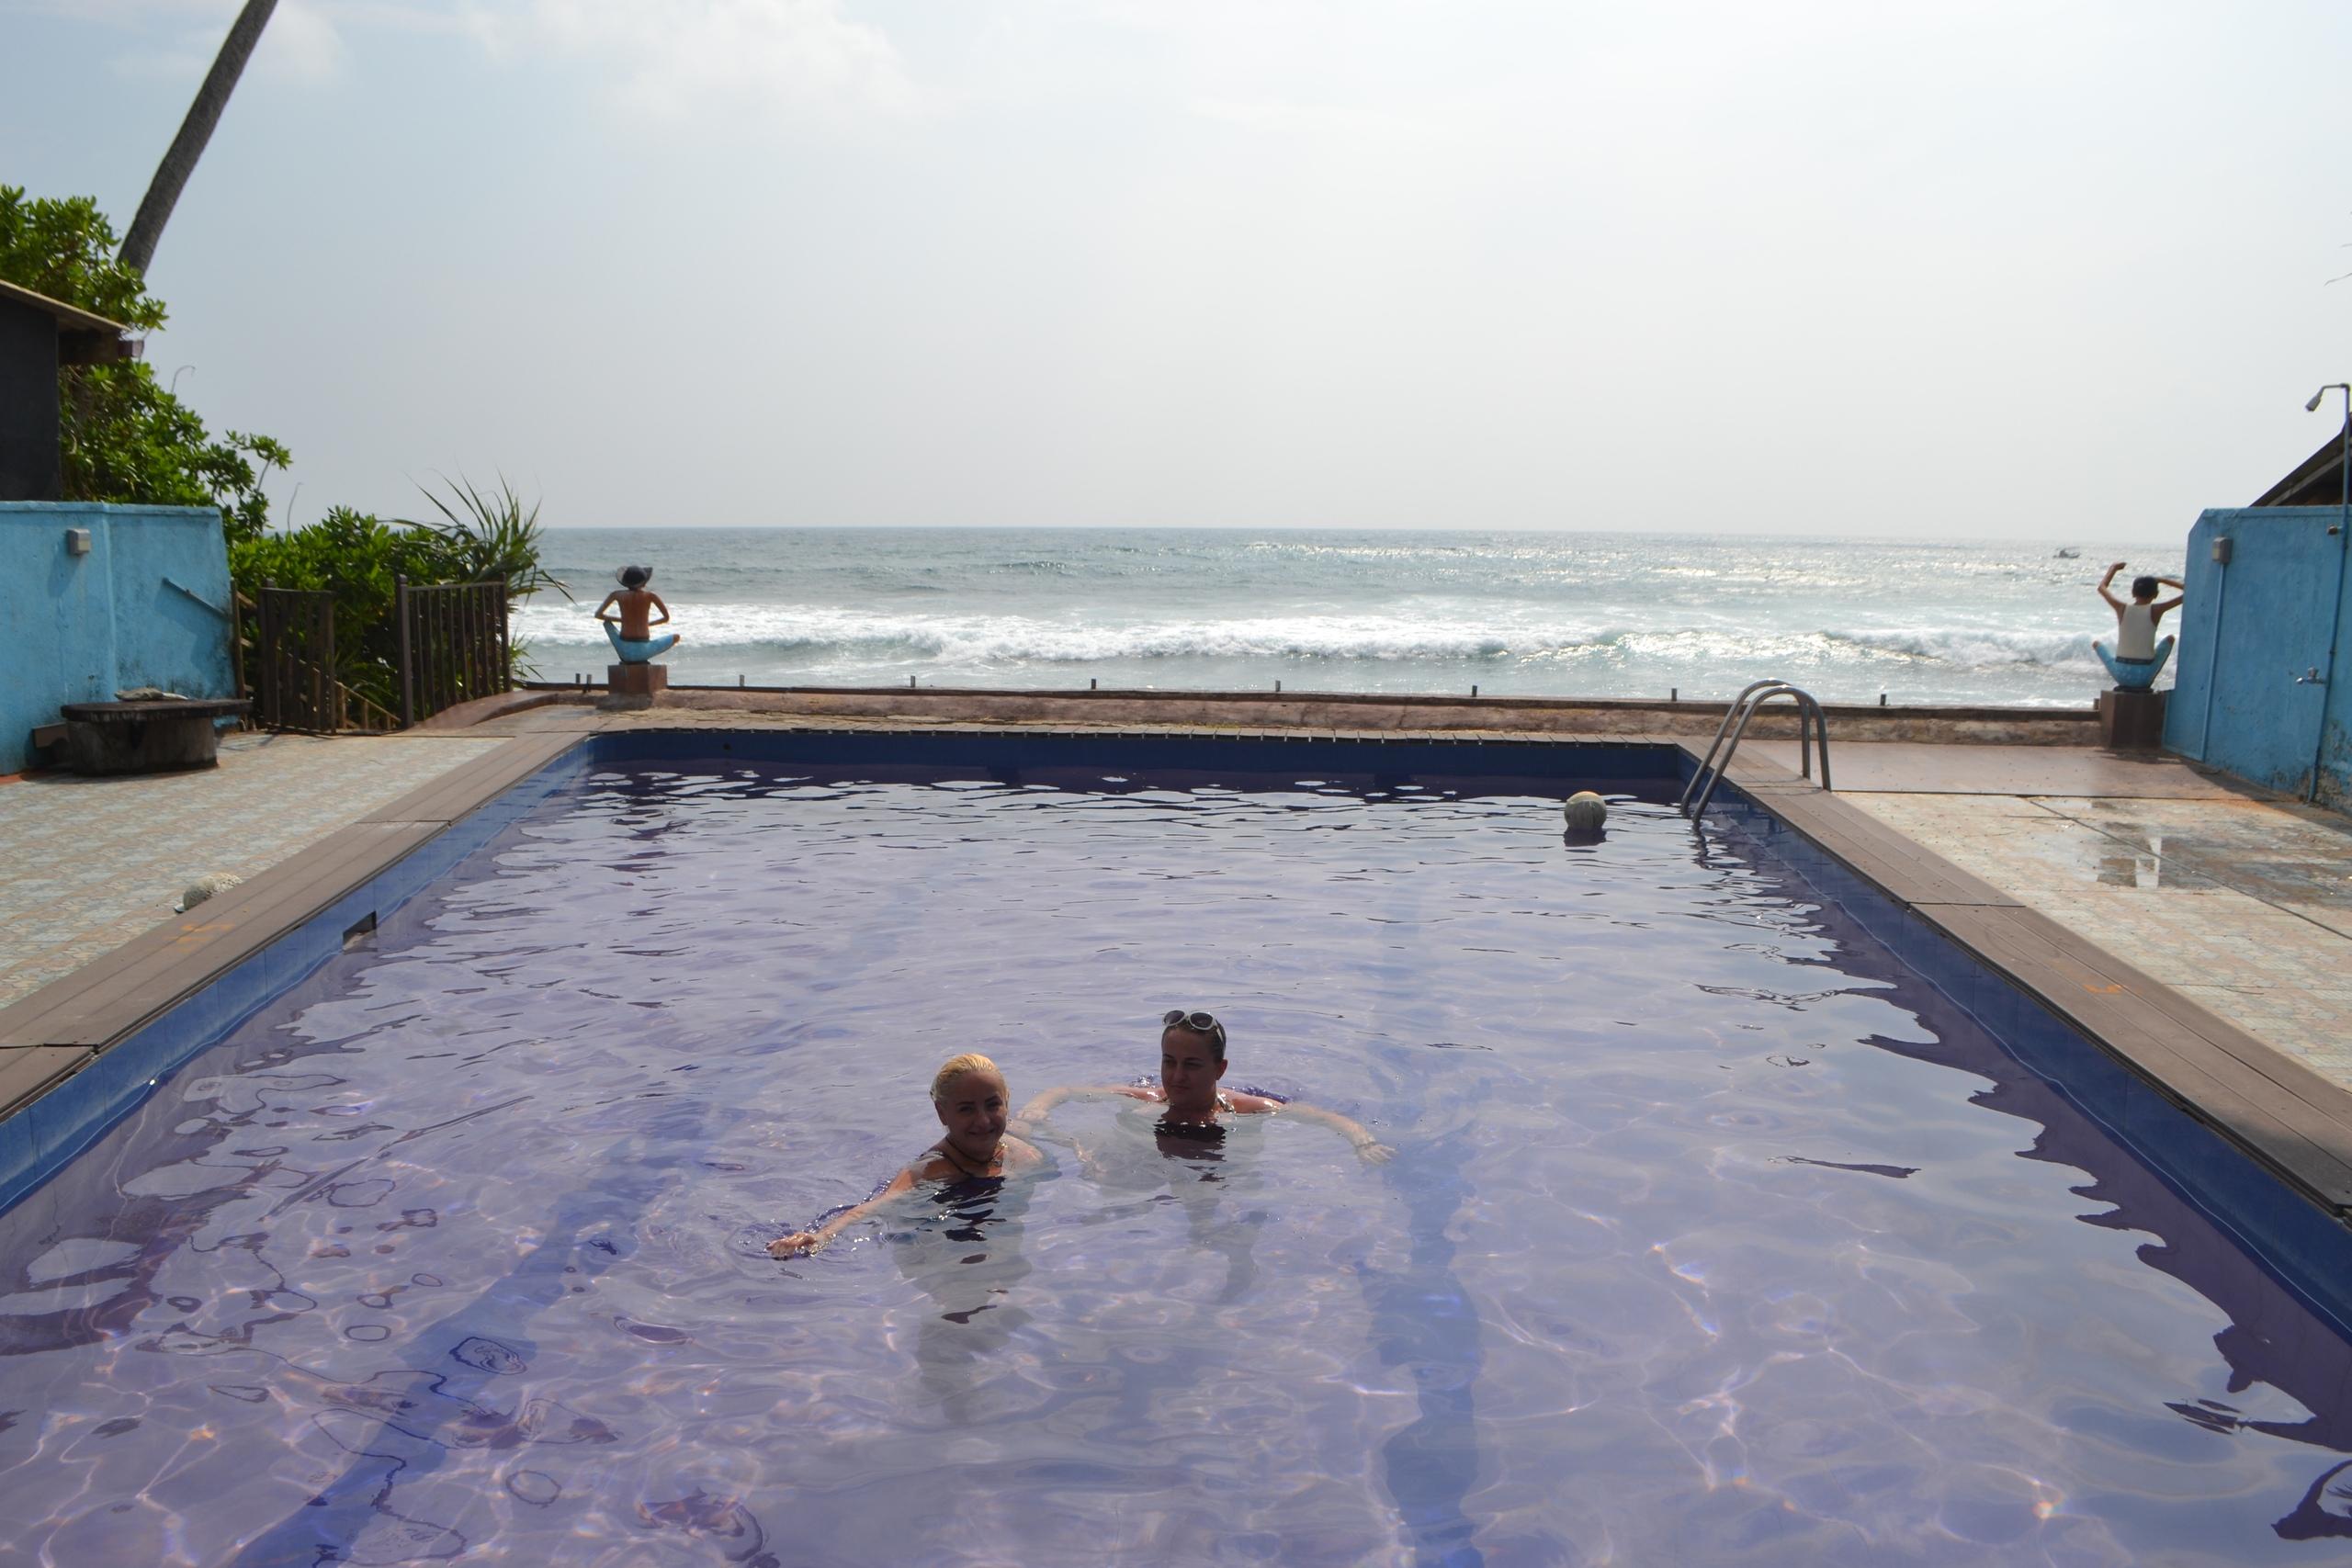 Шри Ланка (фото) ZXk17GbPUVg